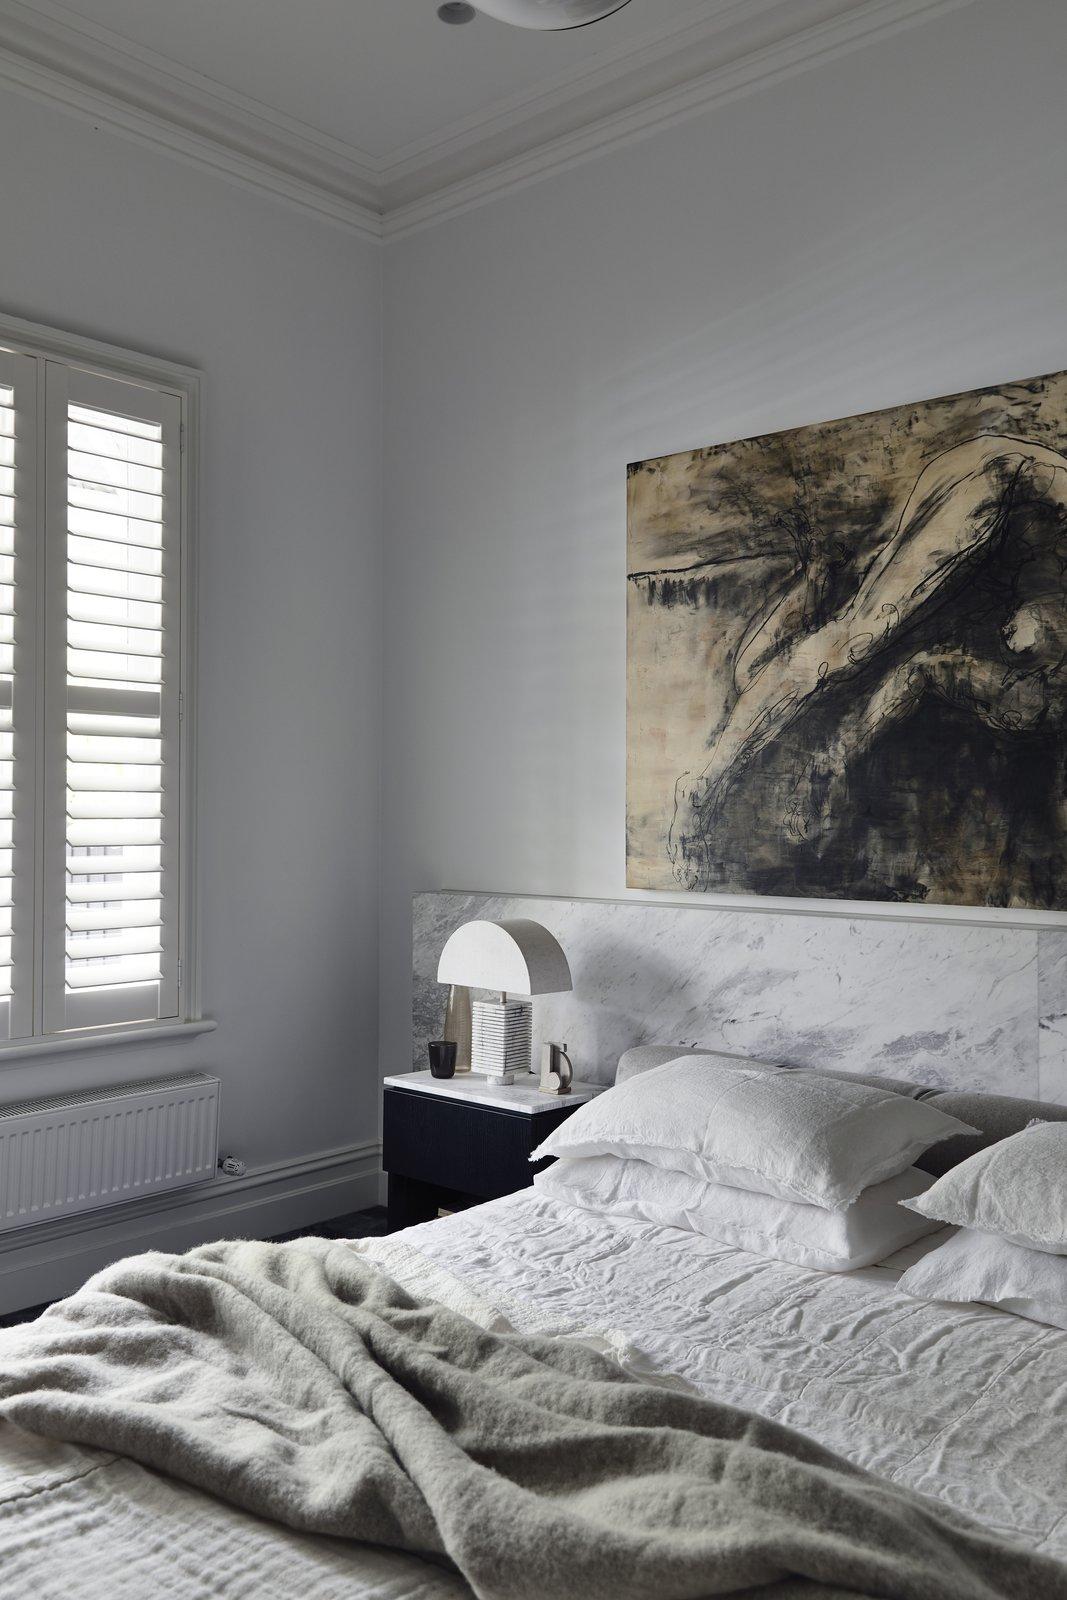 Scandizzo House Kennon+ master bedroom